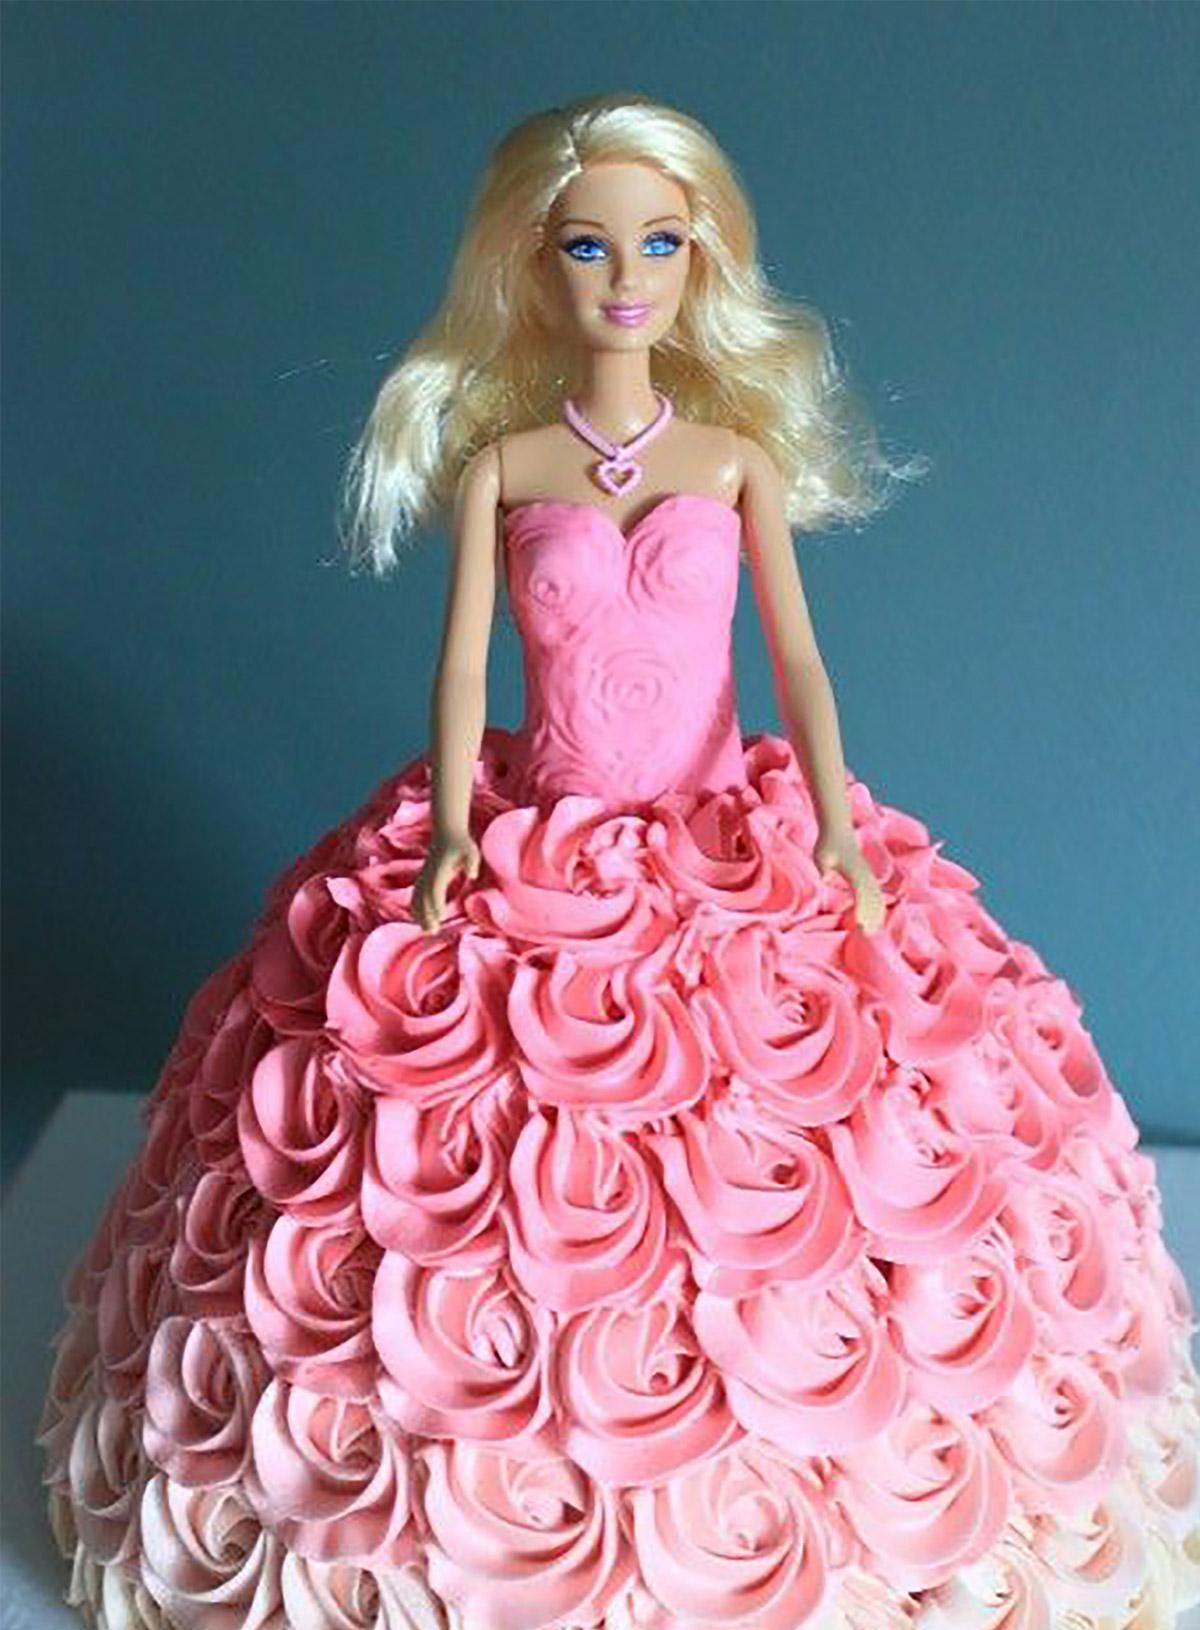 Incredible Cake Decor Plastic Lovely Doll Birthday Cake Topper Cake Birthday Cards Printable Riciscafe Filternl